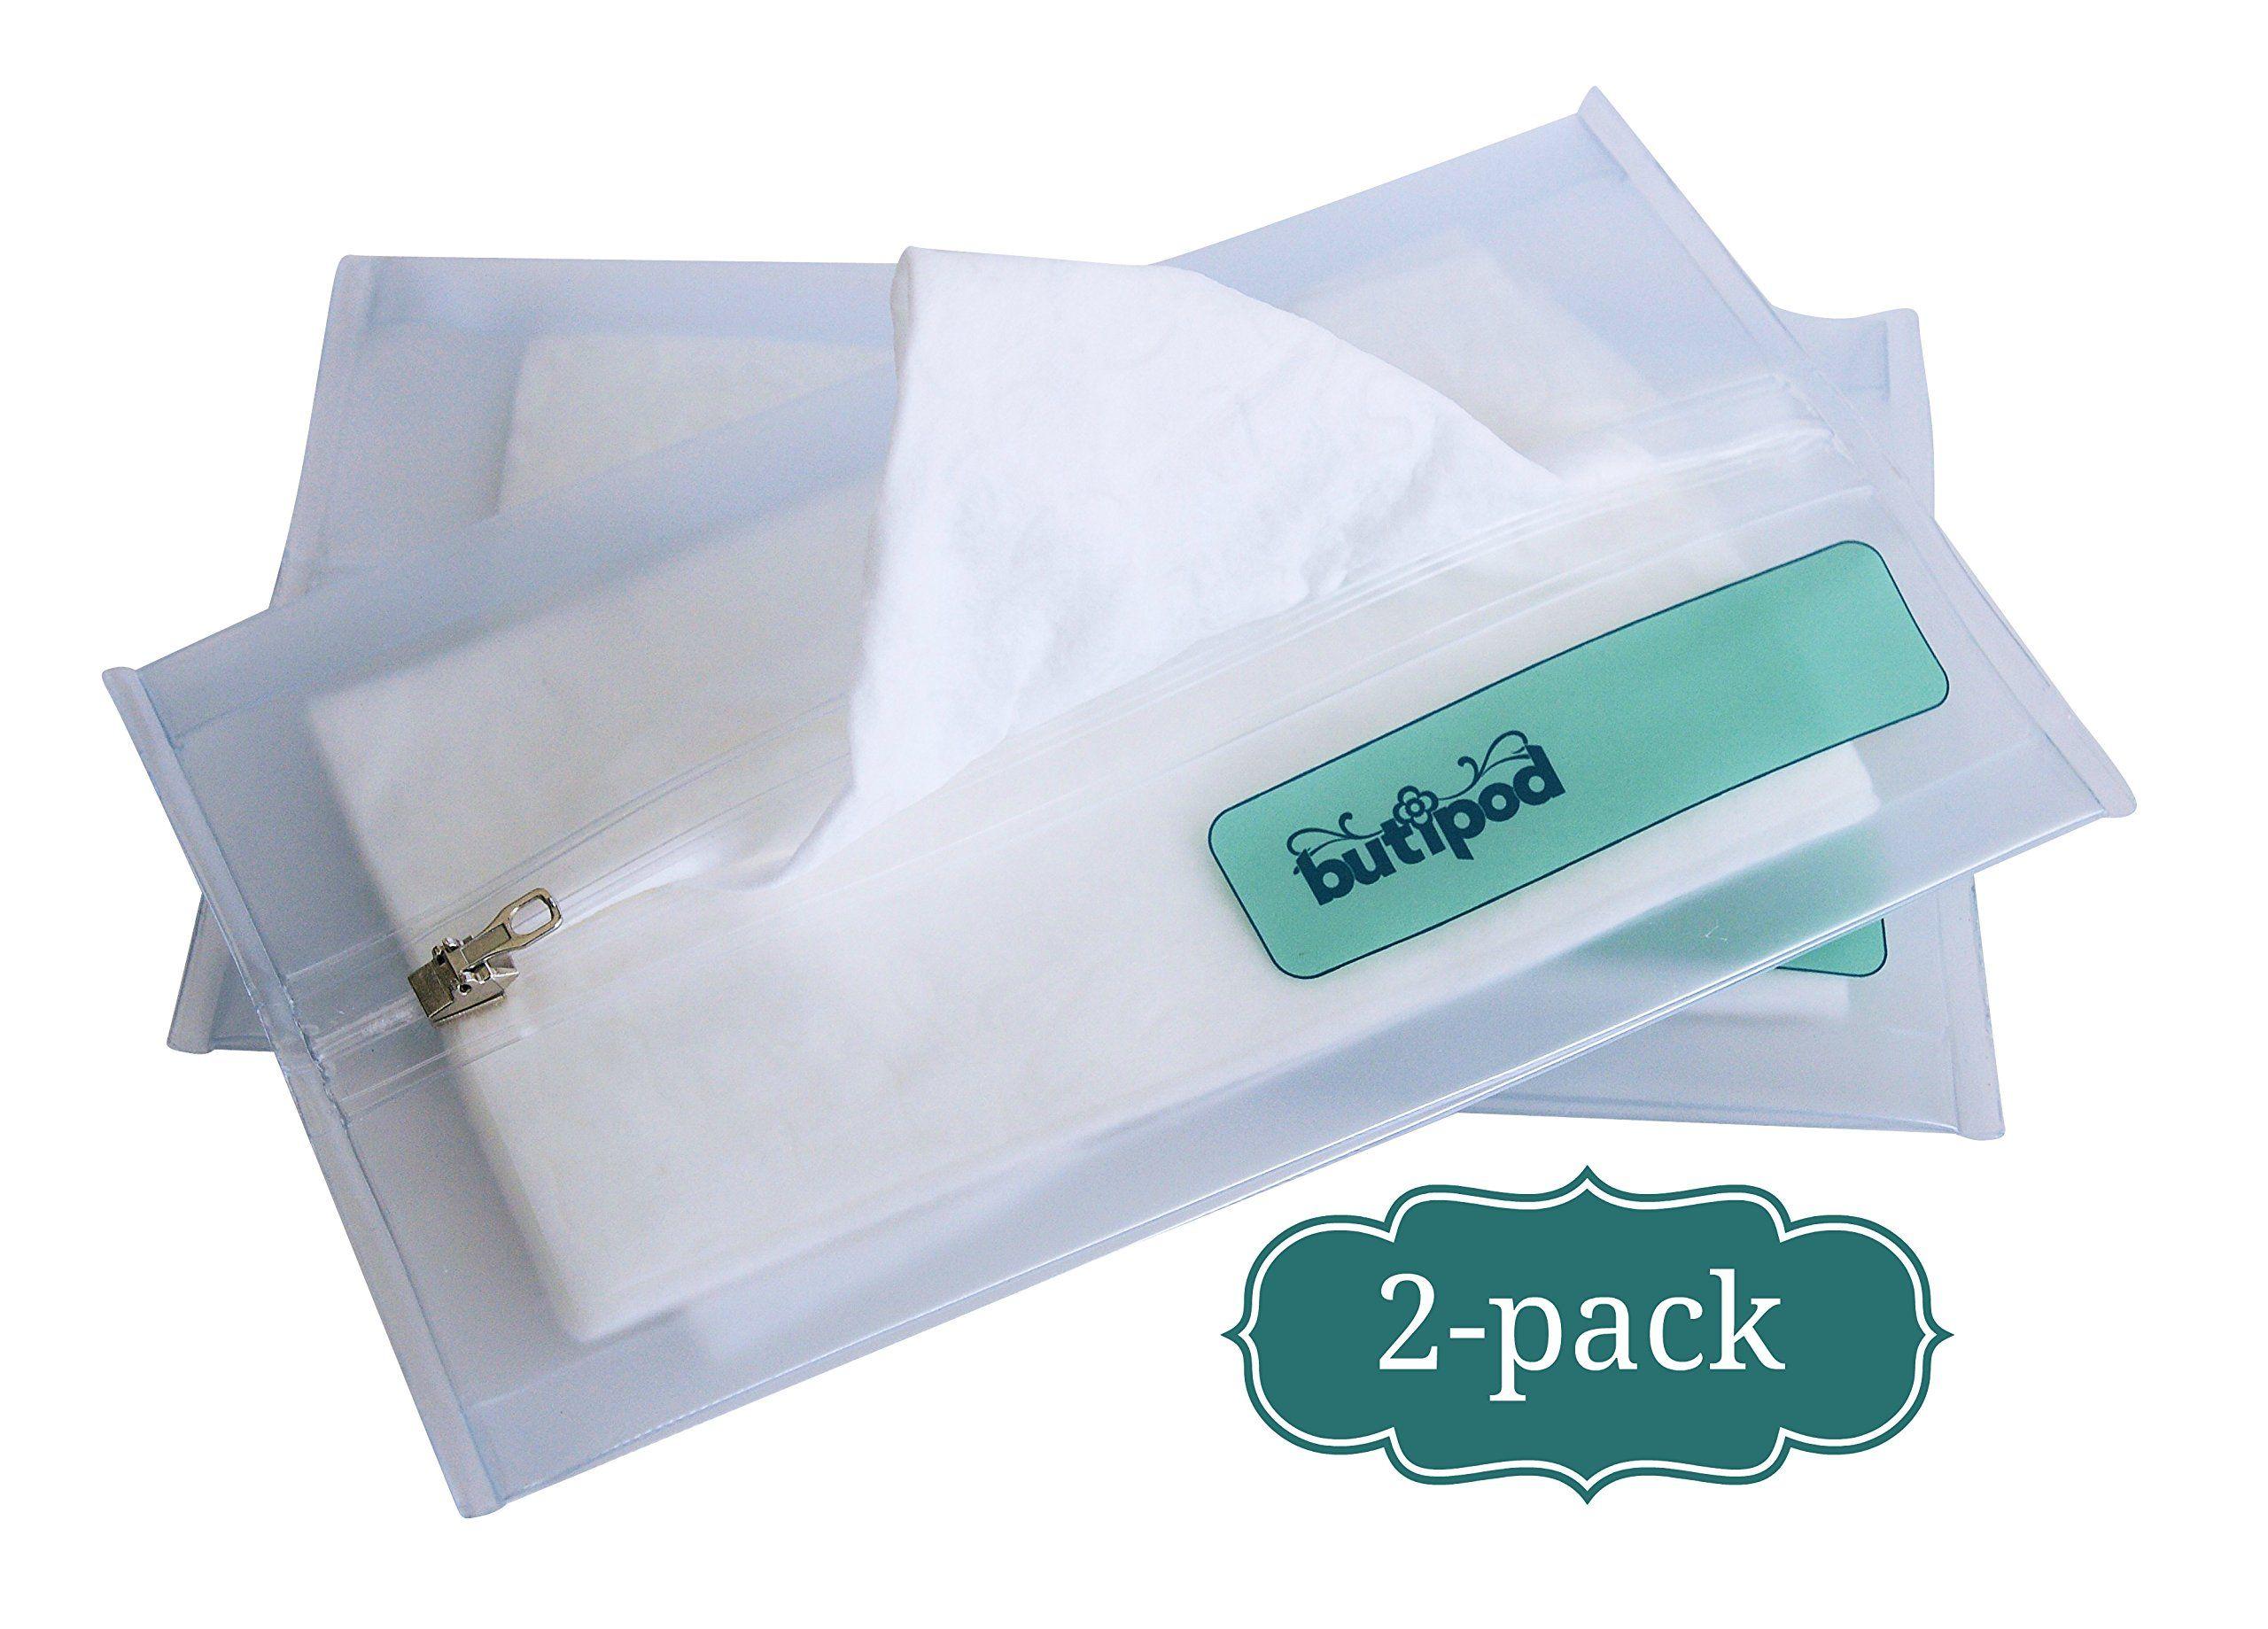 Butipods V4.0 Slim Wipes Travel Cases Keeps Wet Wipes Wet